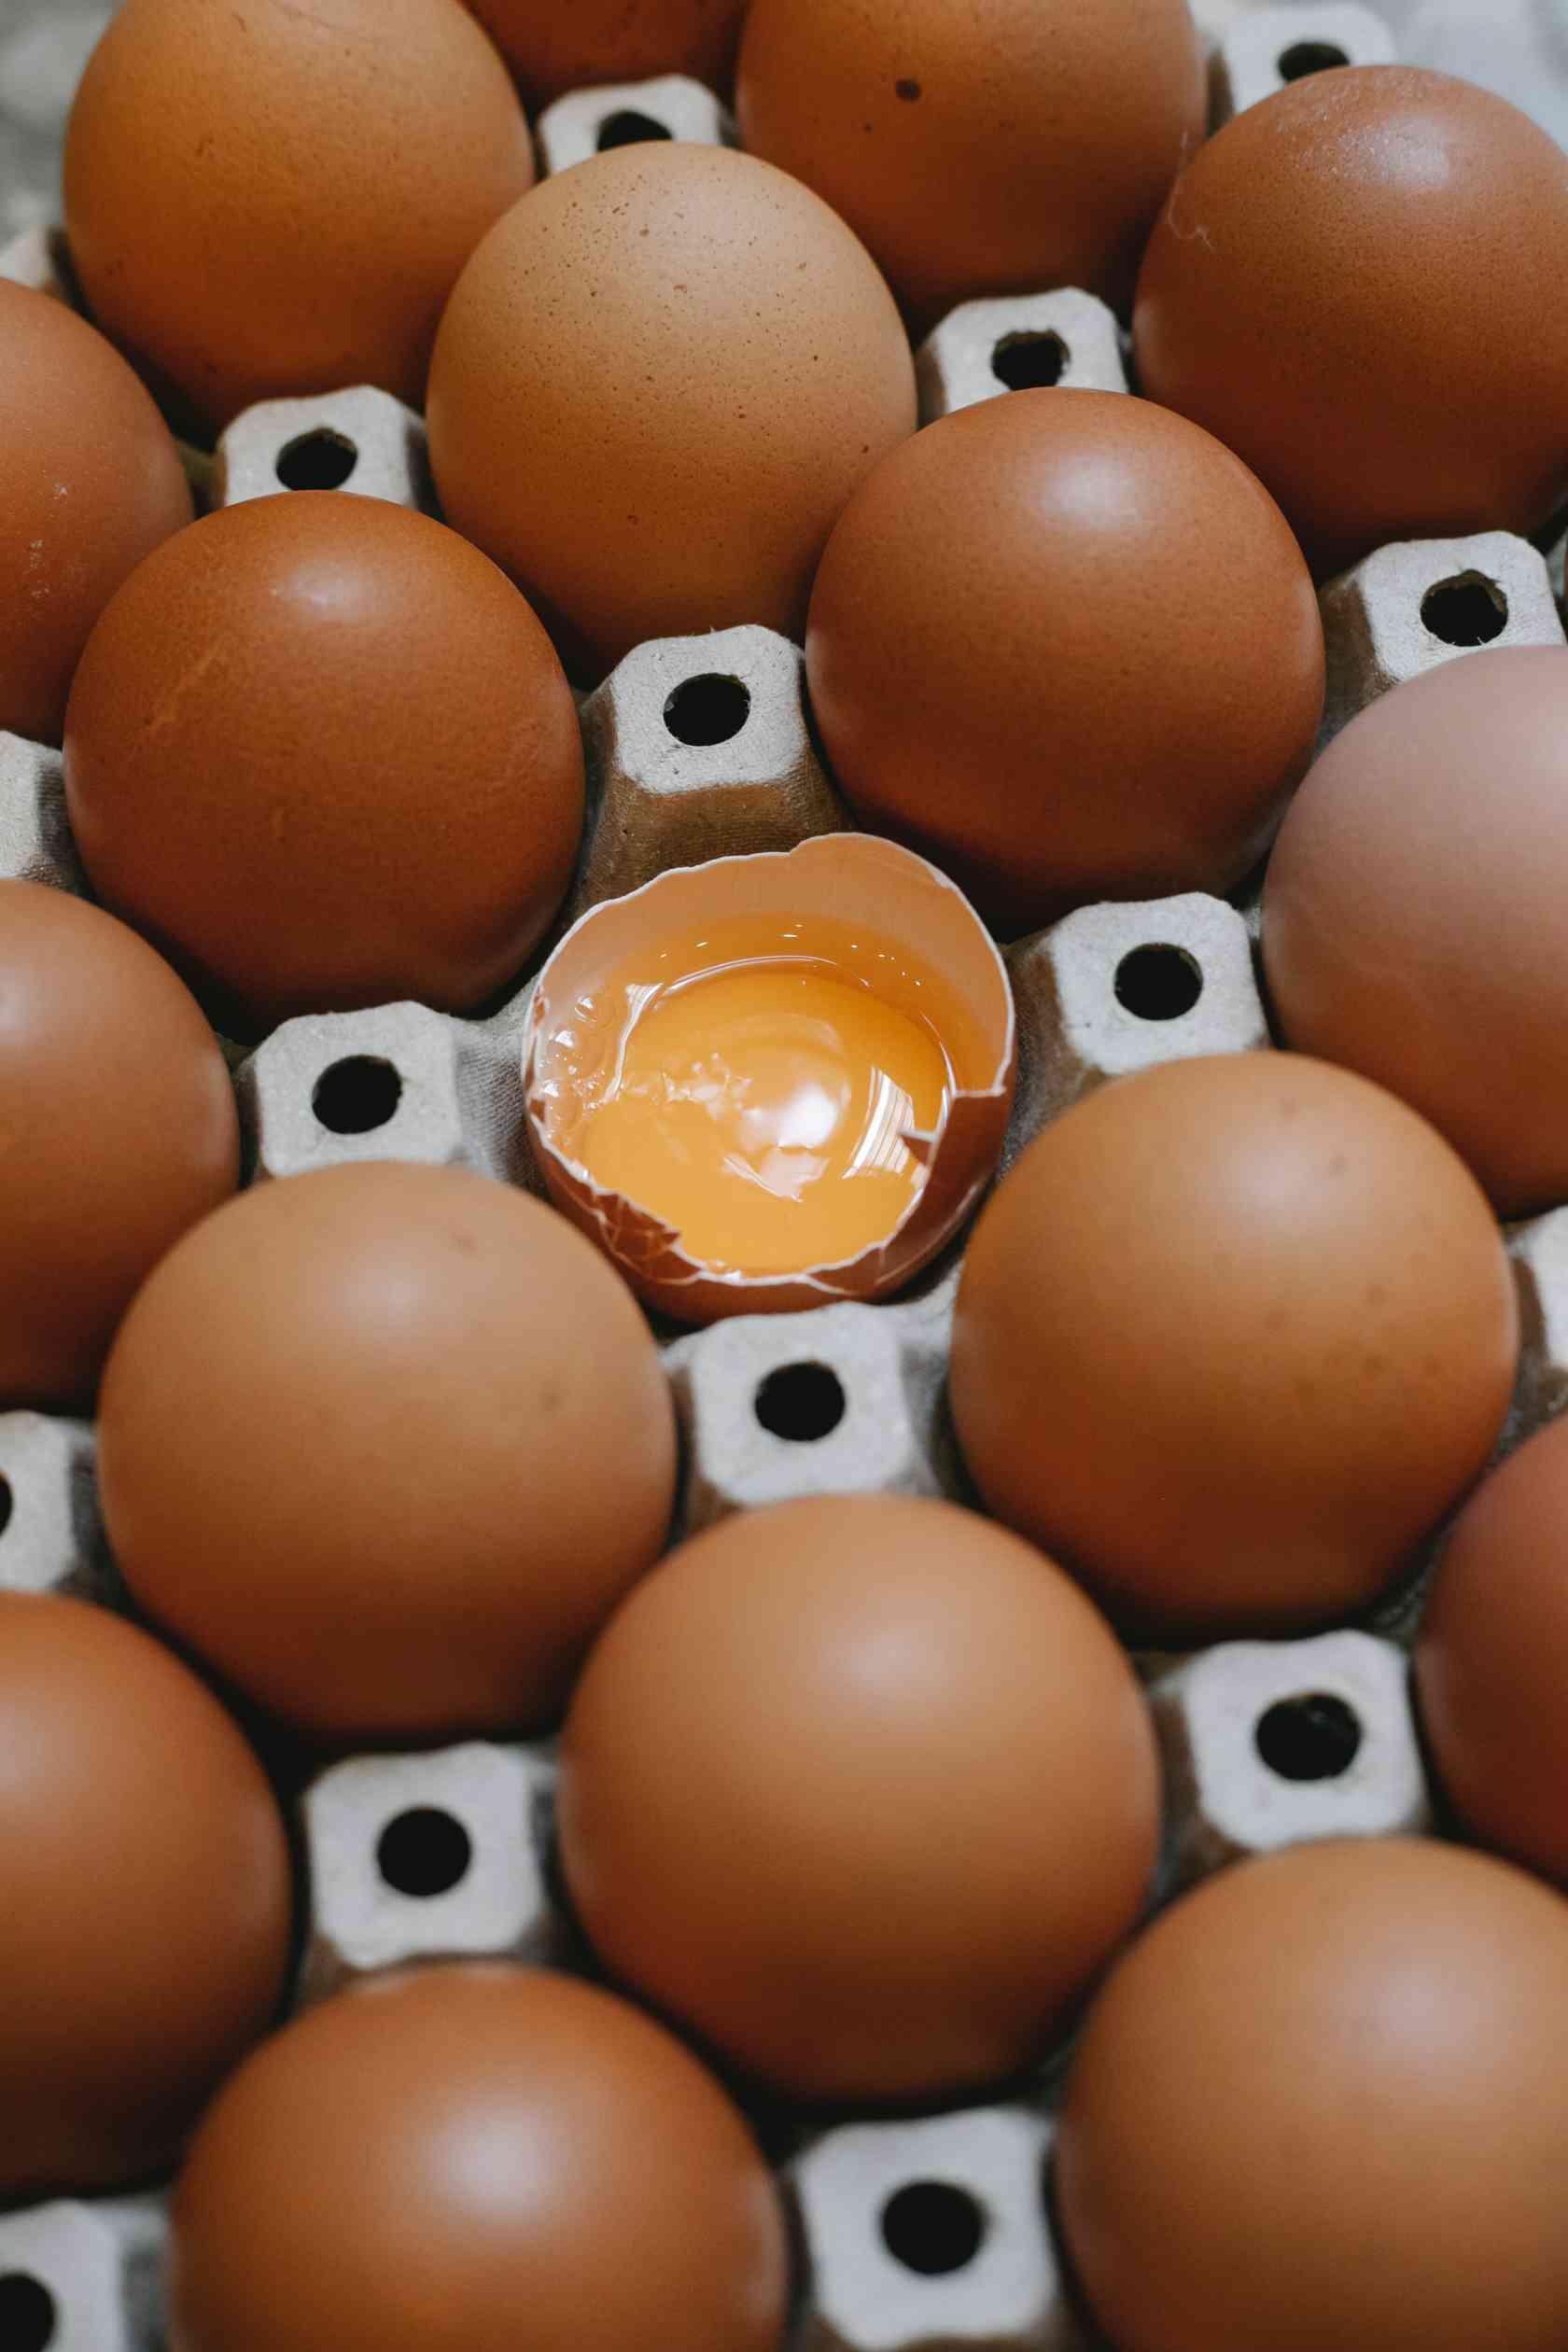 Yellow yoke of a brown eggs